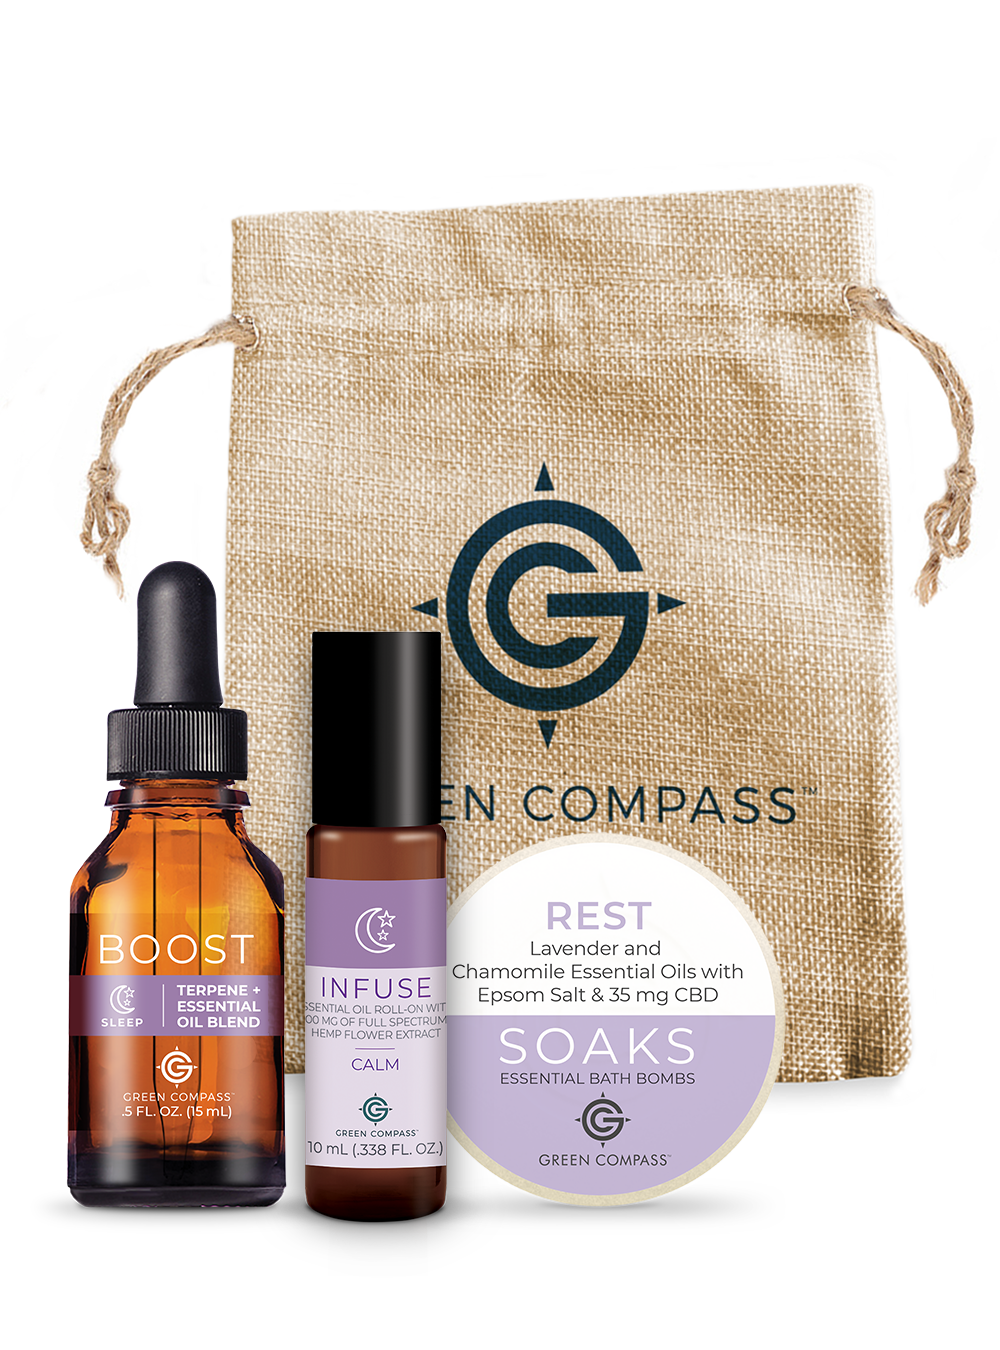 Green Compass Sleep Bundle